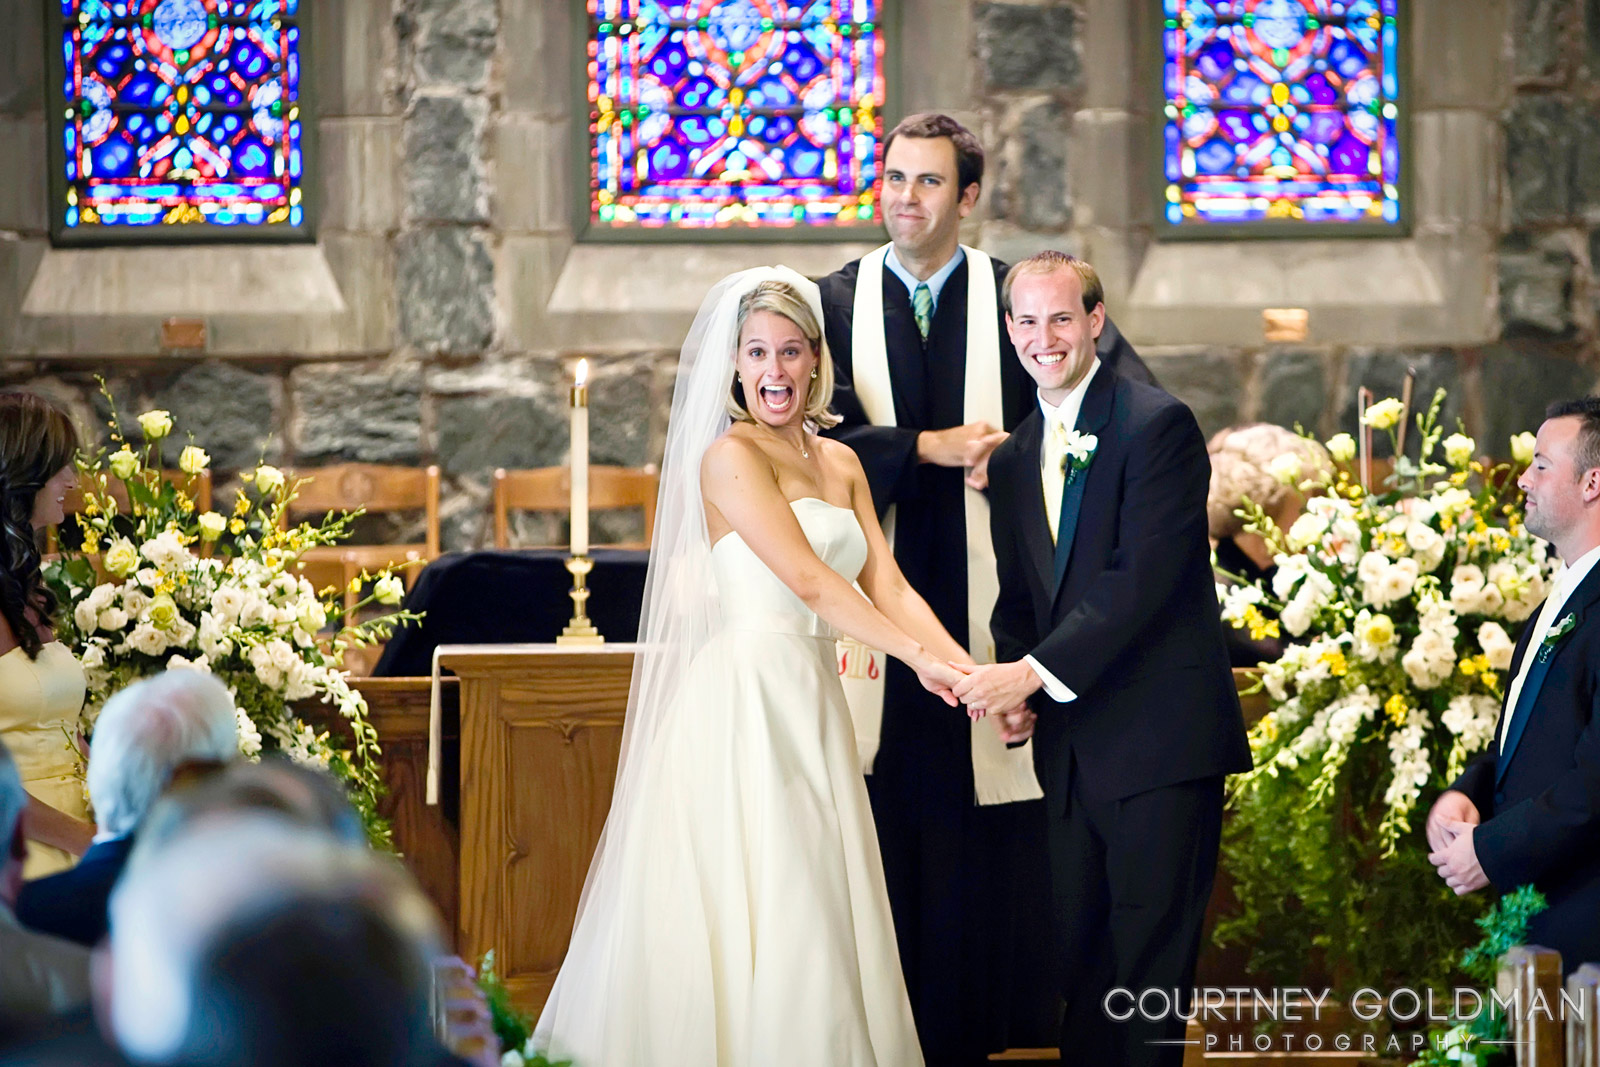 Atlanta-Wedding-Photography-by-Courtney-Goldman-12.jpg